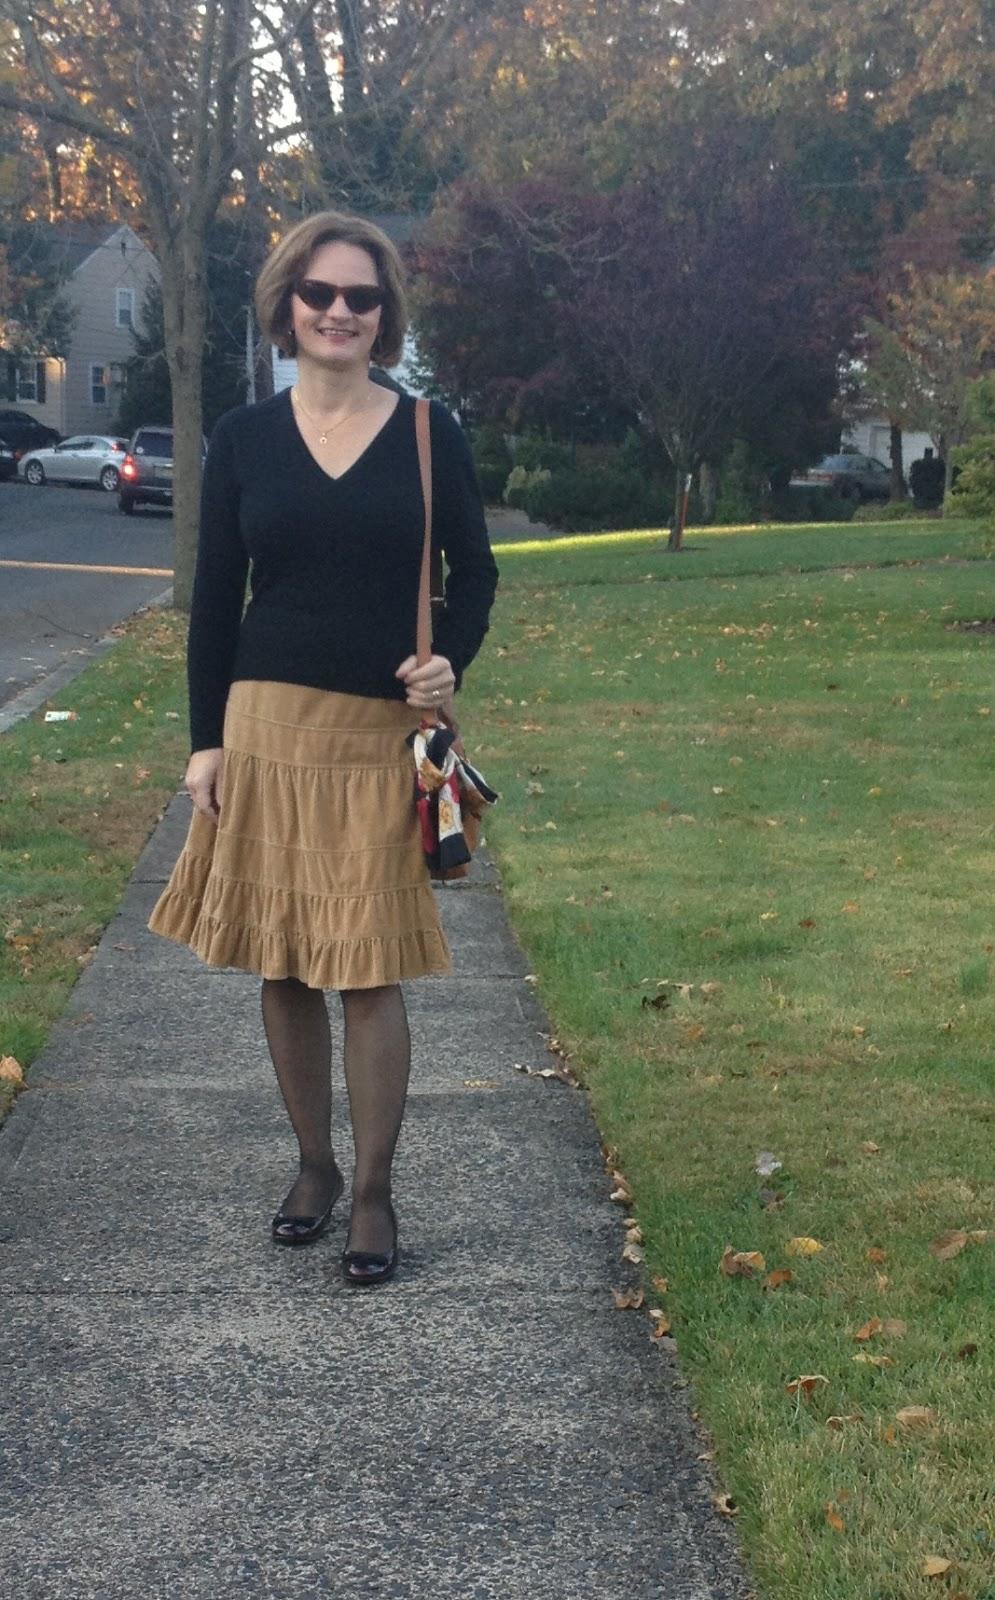 Jc shopping habit i wear full skirts i wear high heels